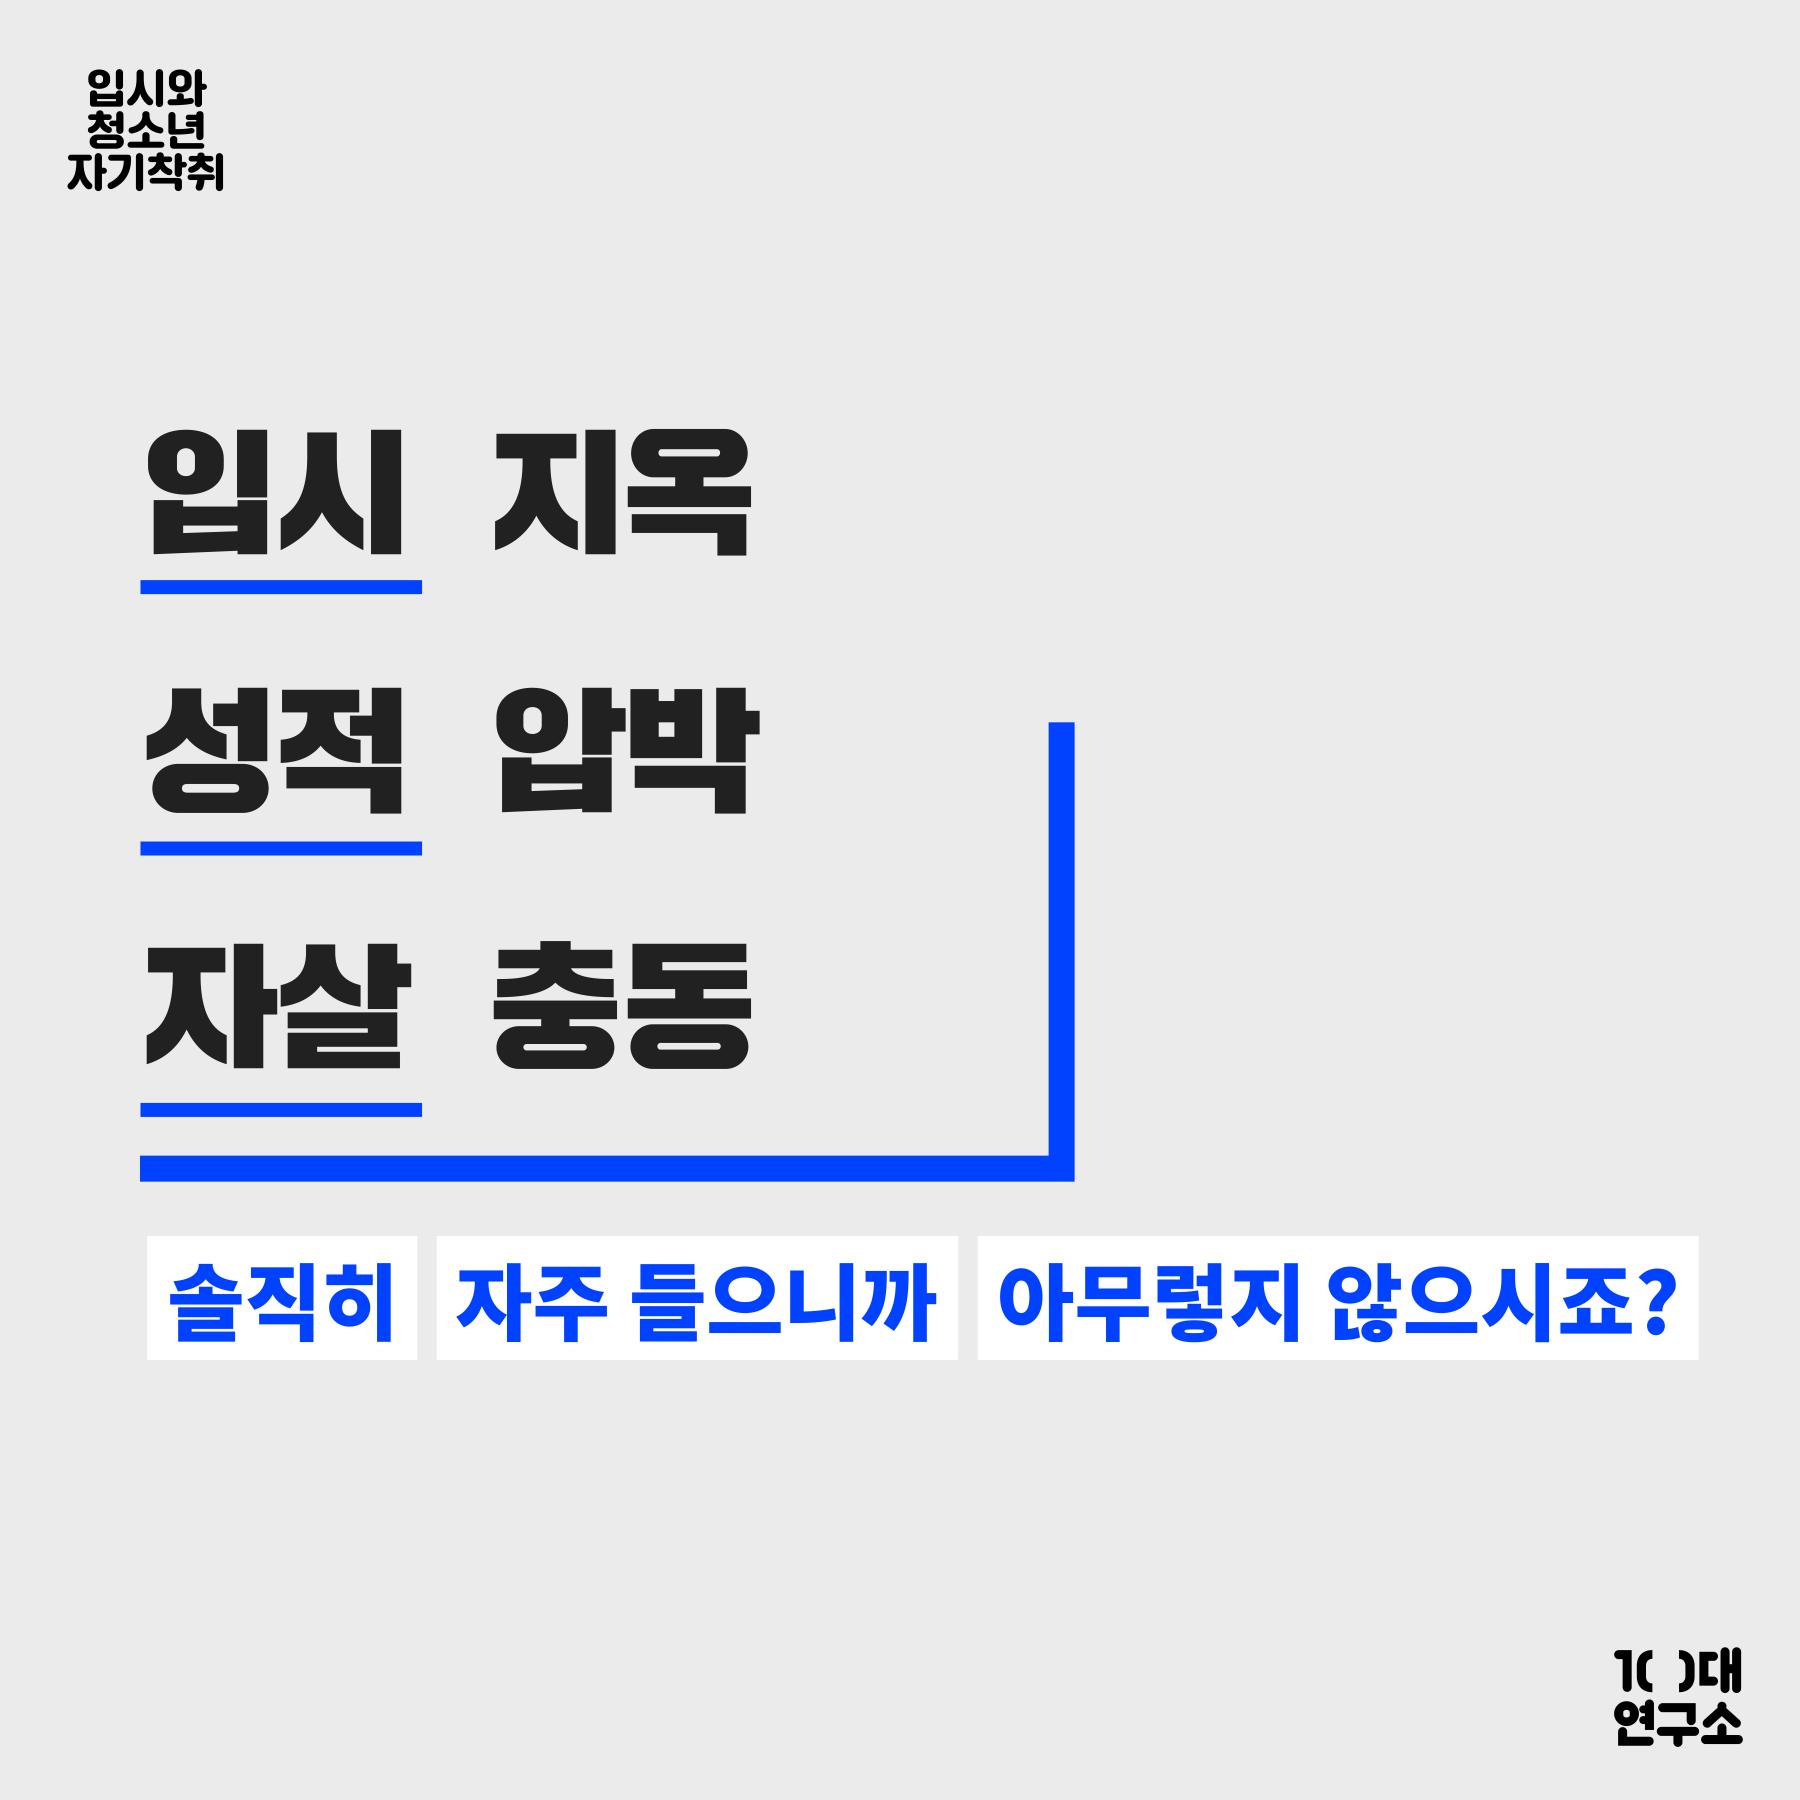 A_입시와 청소년 자기착취_4.png